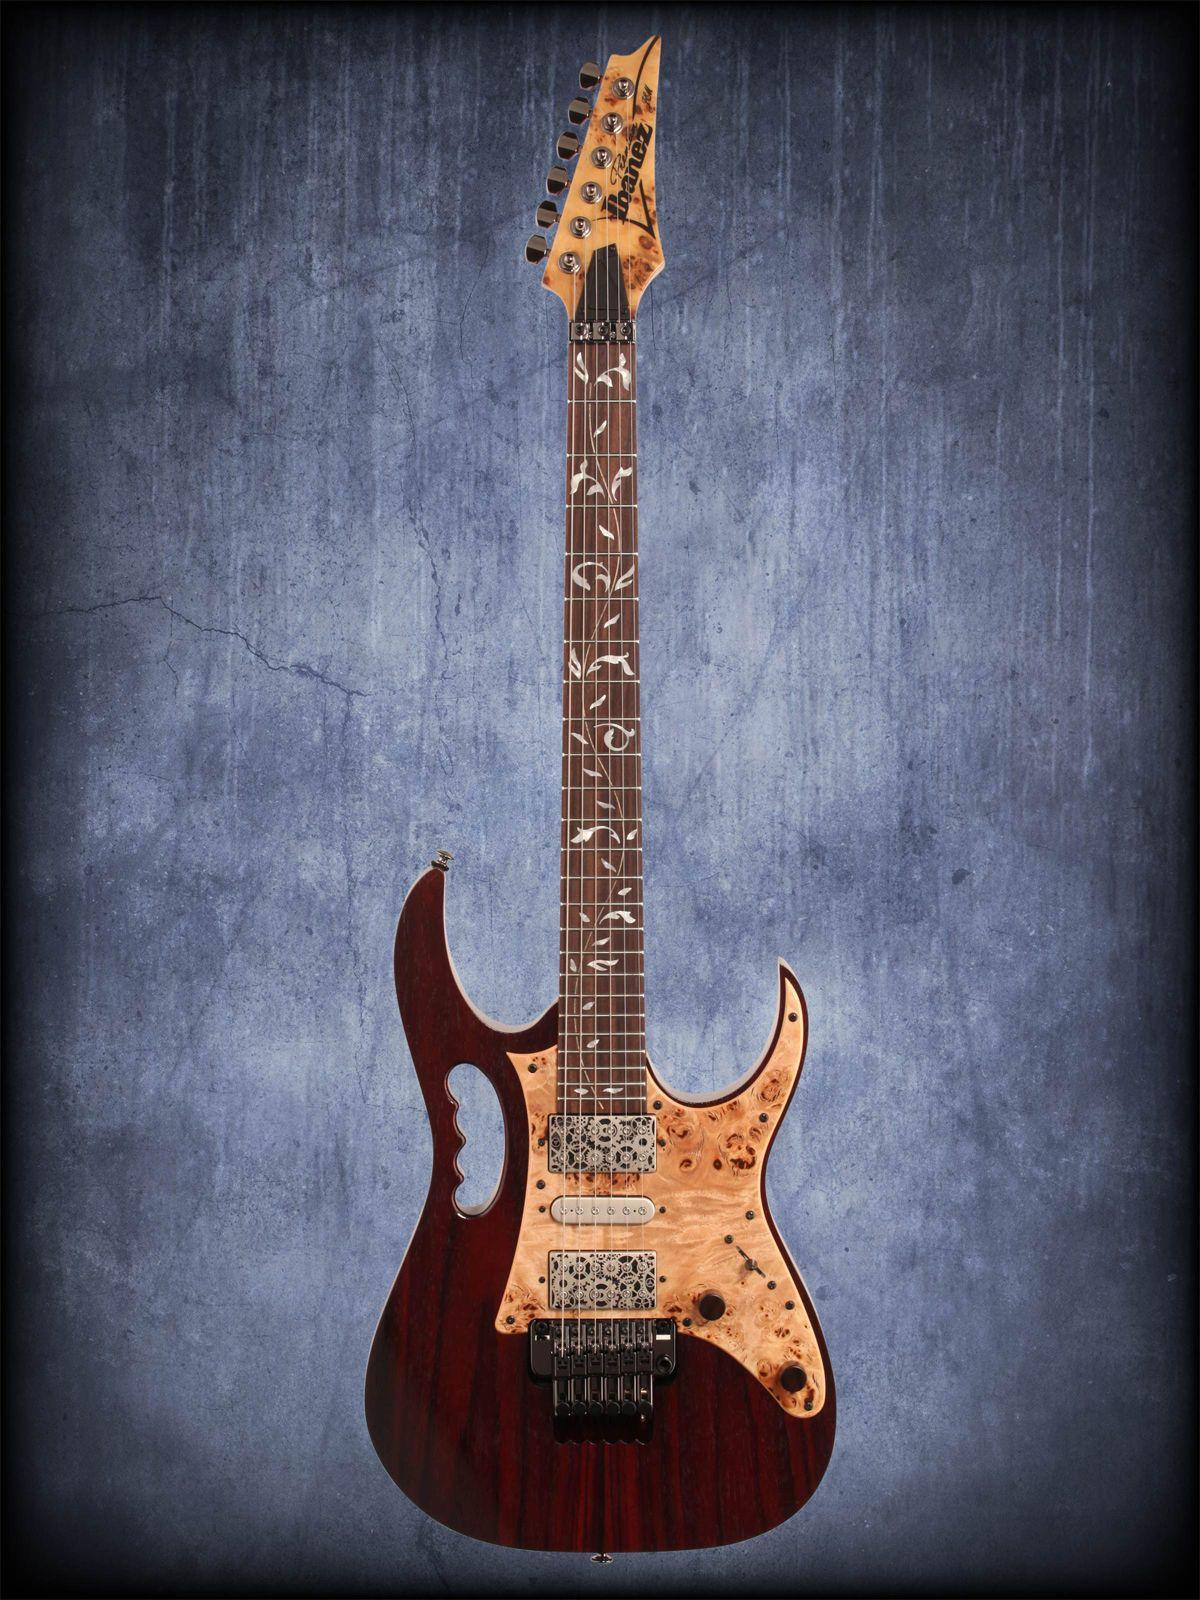 Ibanez Steve Vai JEM77WDP Signature Woody ElectricGuitar Guitar Ibanez SteveVai